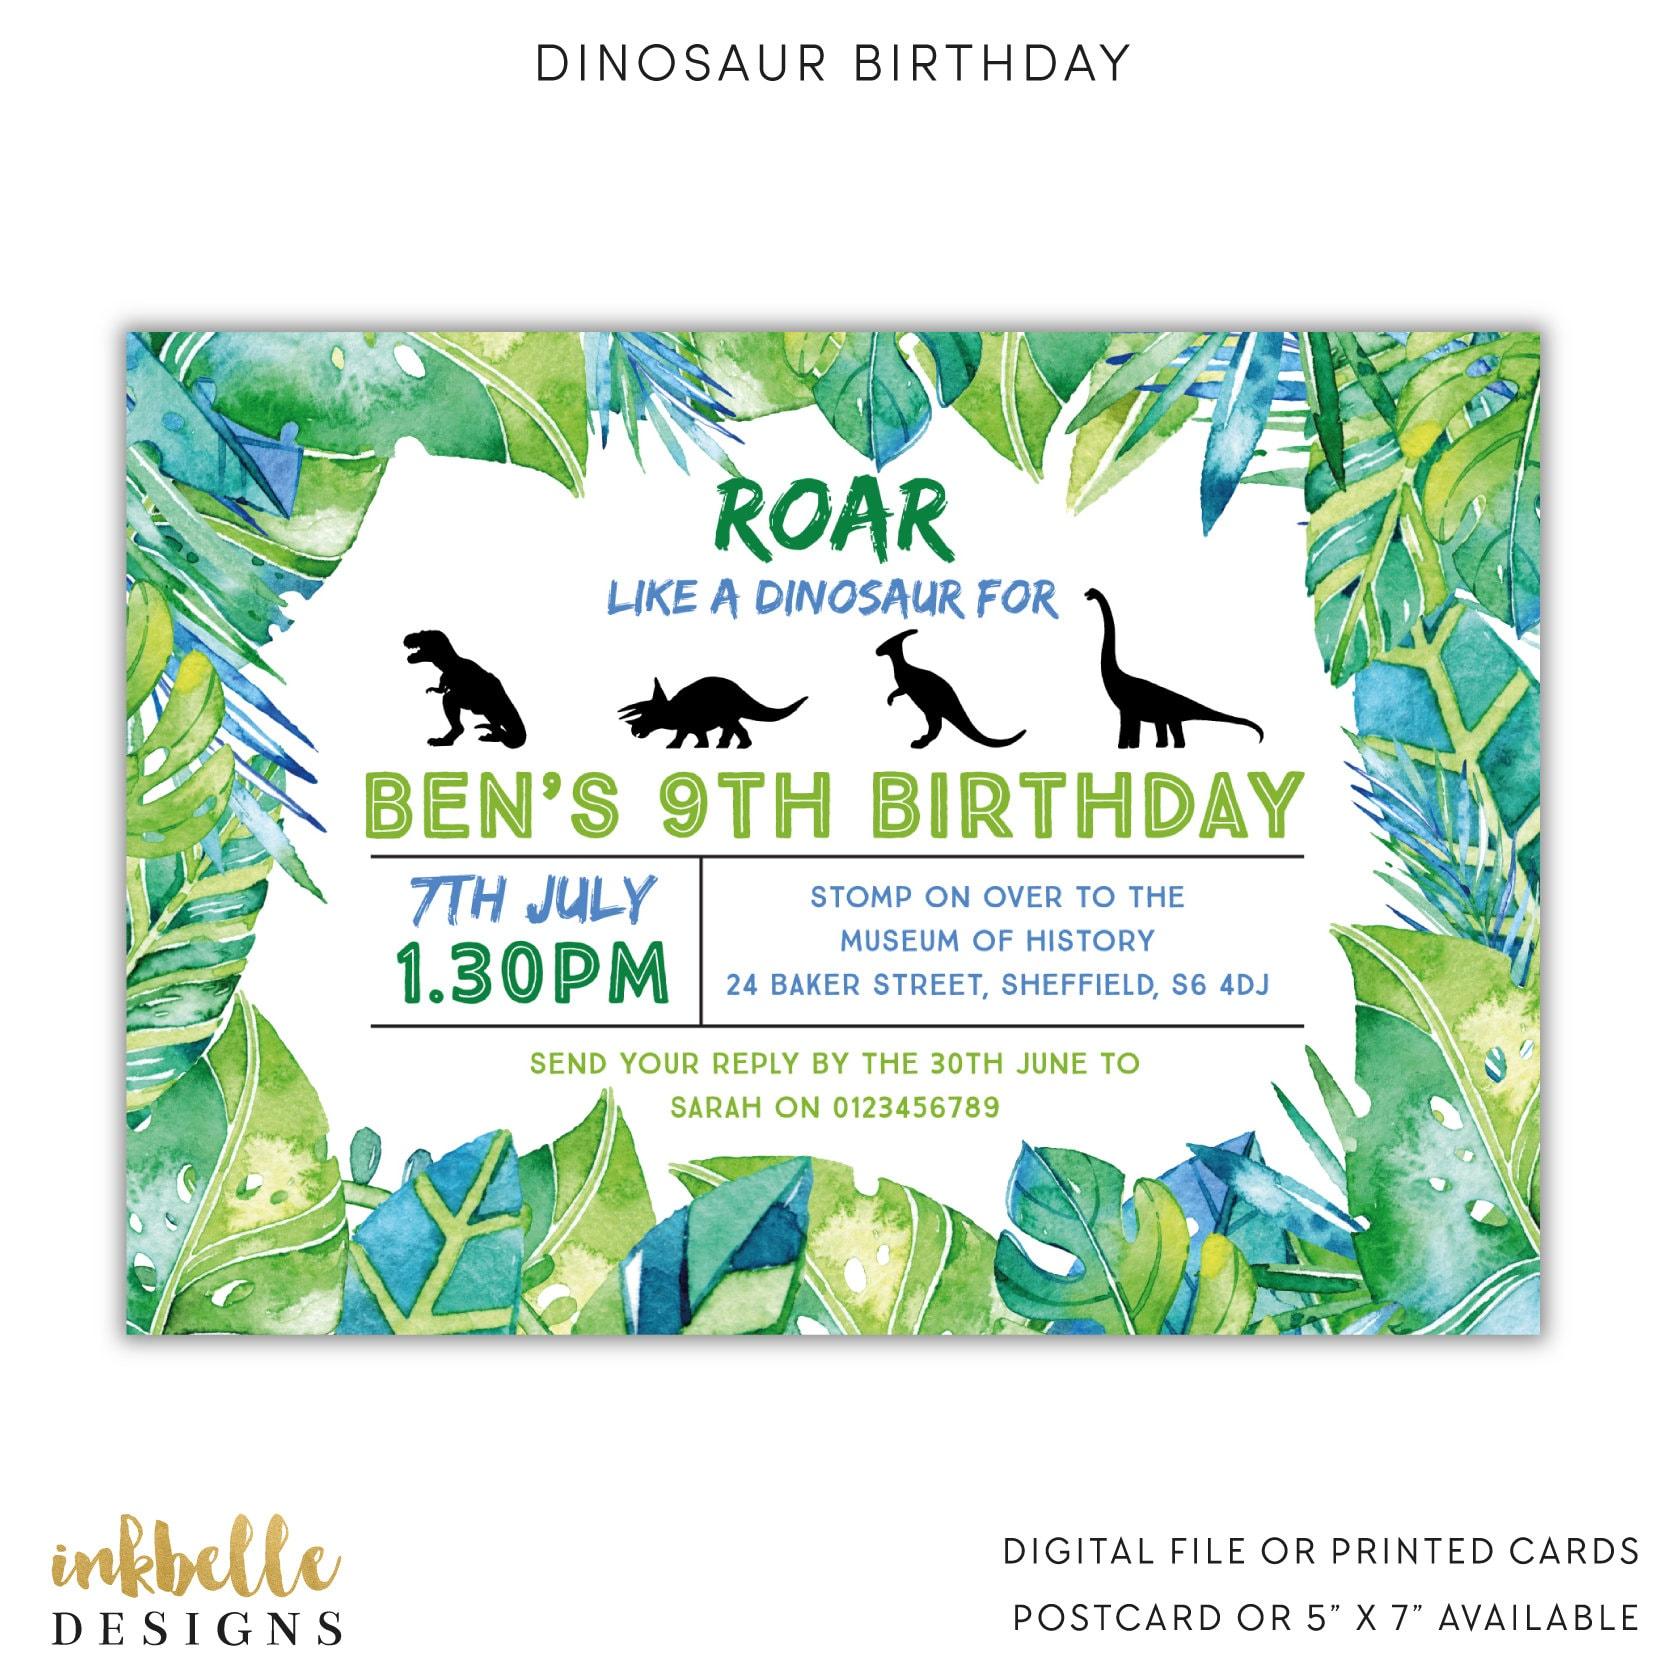 Dinosaur Birthday Invitation Printed Cards Digital File | Etsy